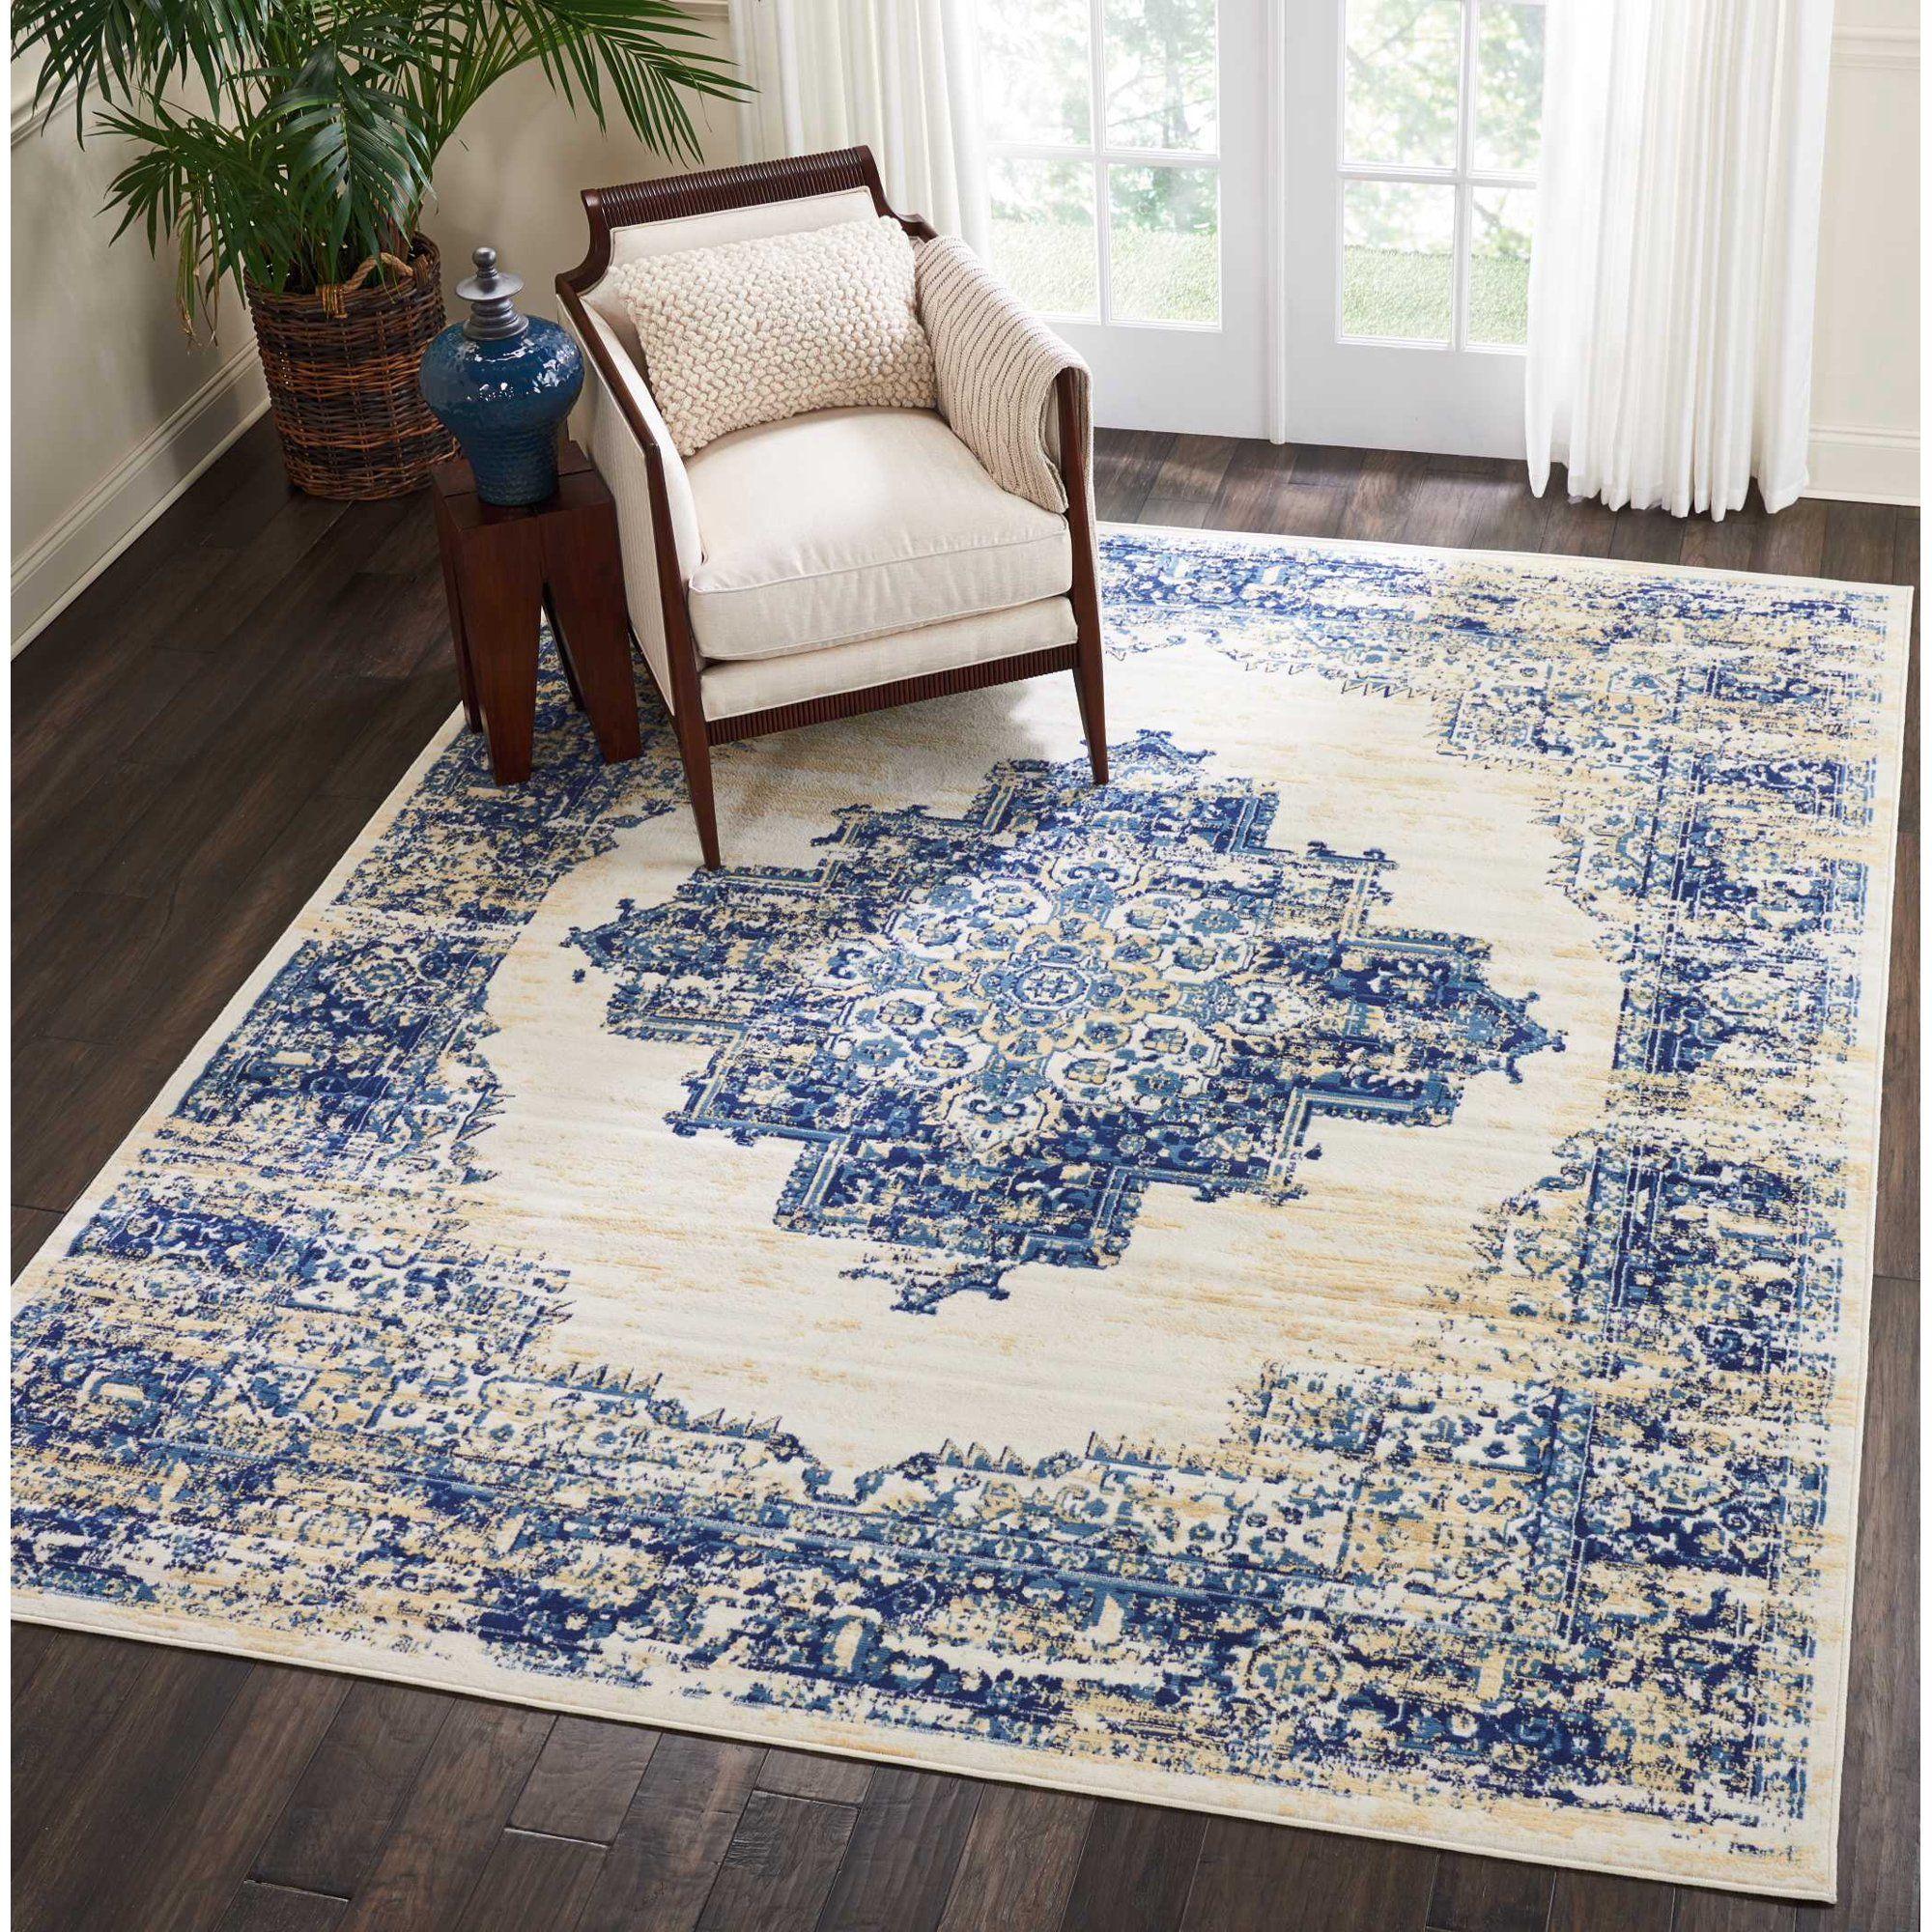 Nourison Grafix Center Medallion White Area Rug Walmart Com In 2021 Area Rugs Cheap Large Area Rugs Area Rugs Center carpet for living room